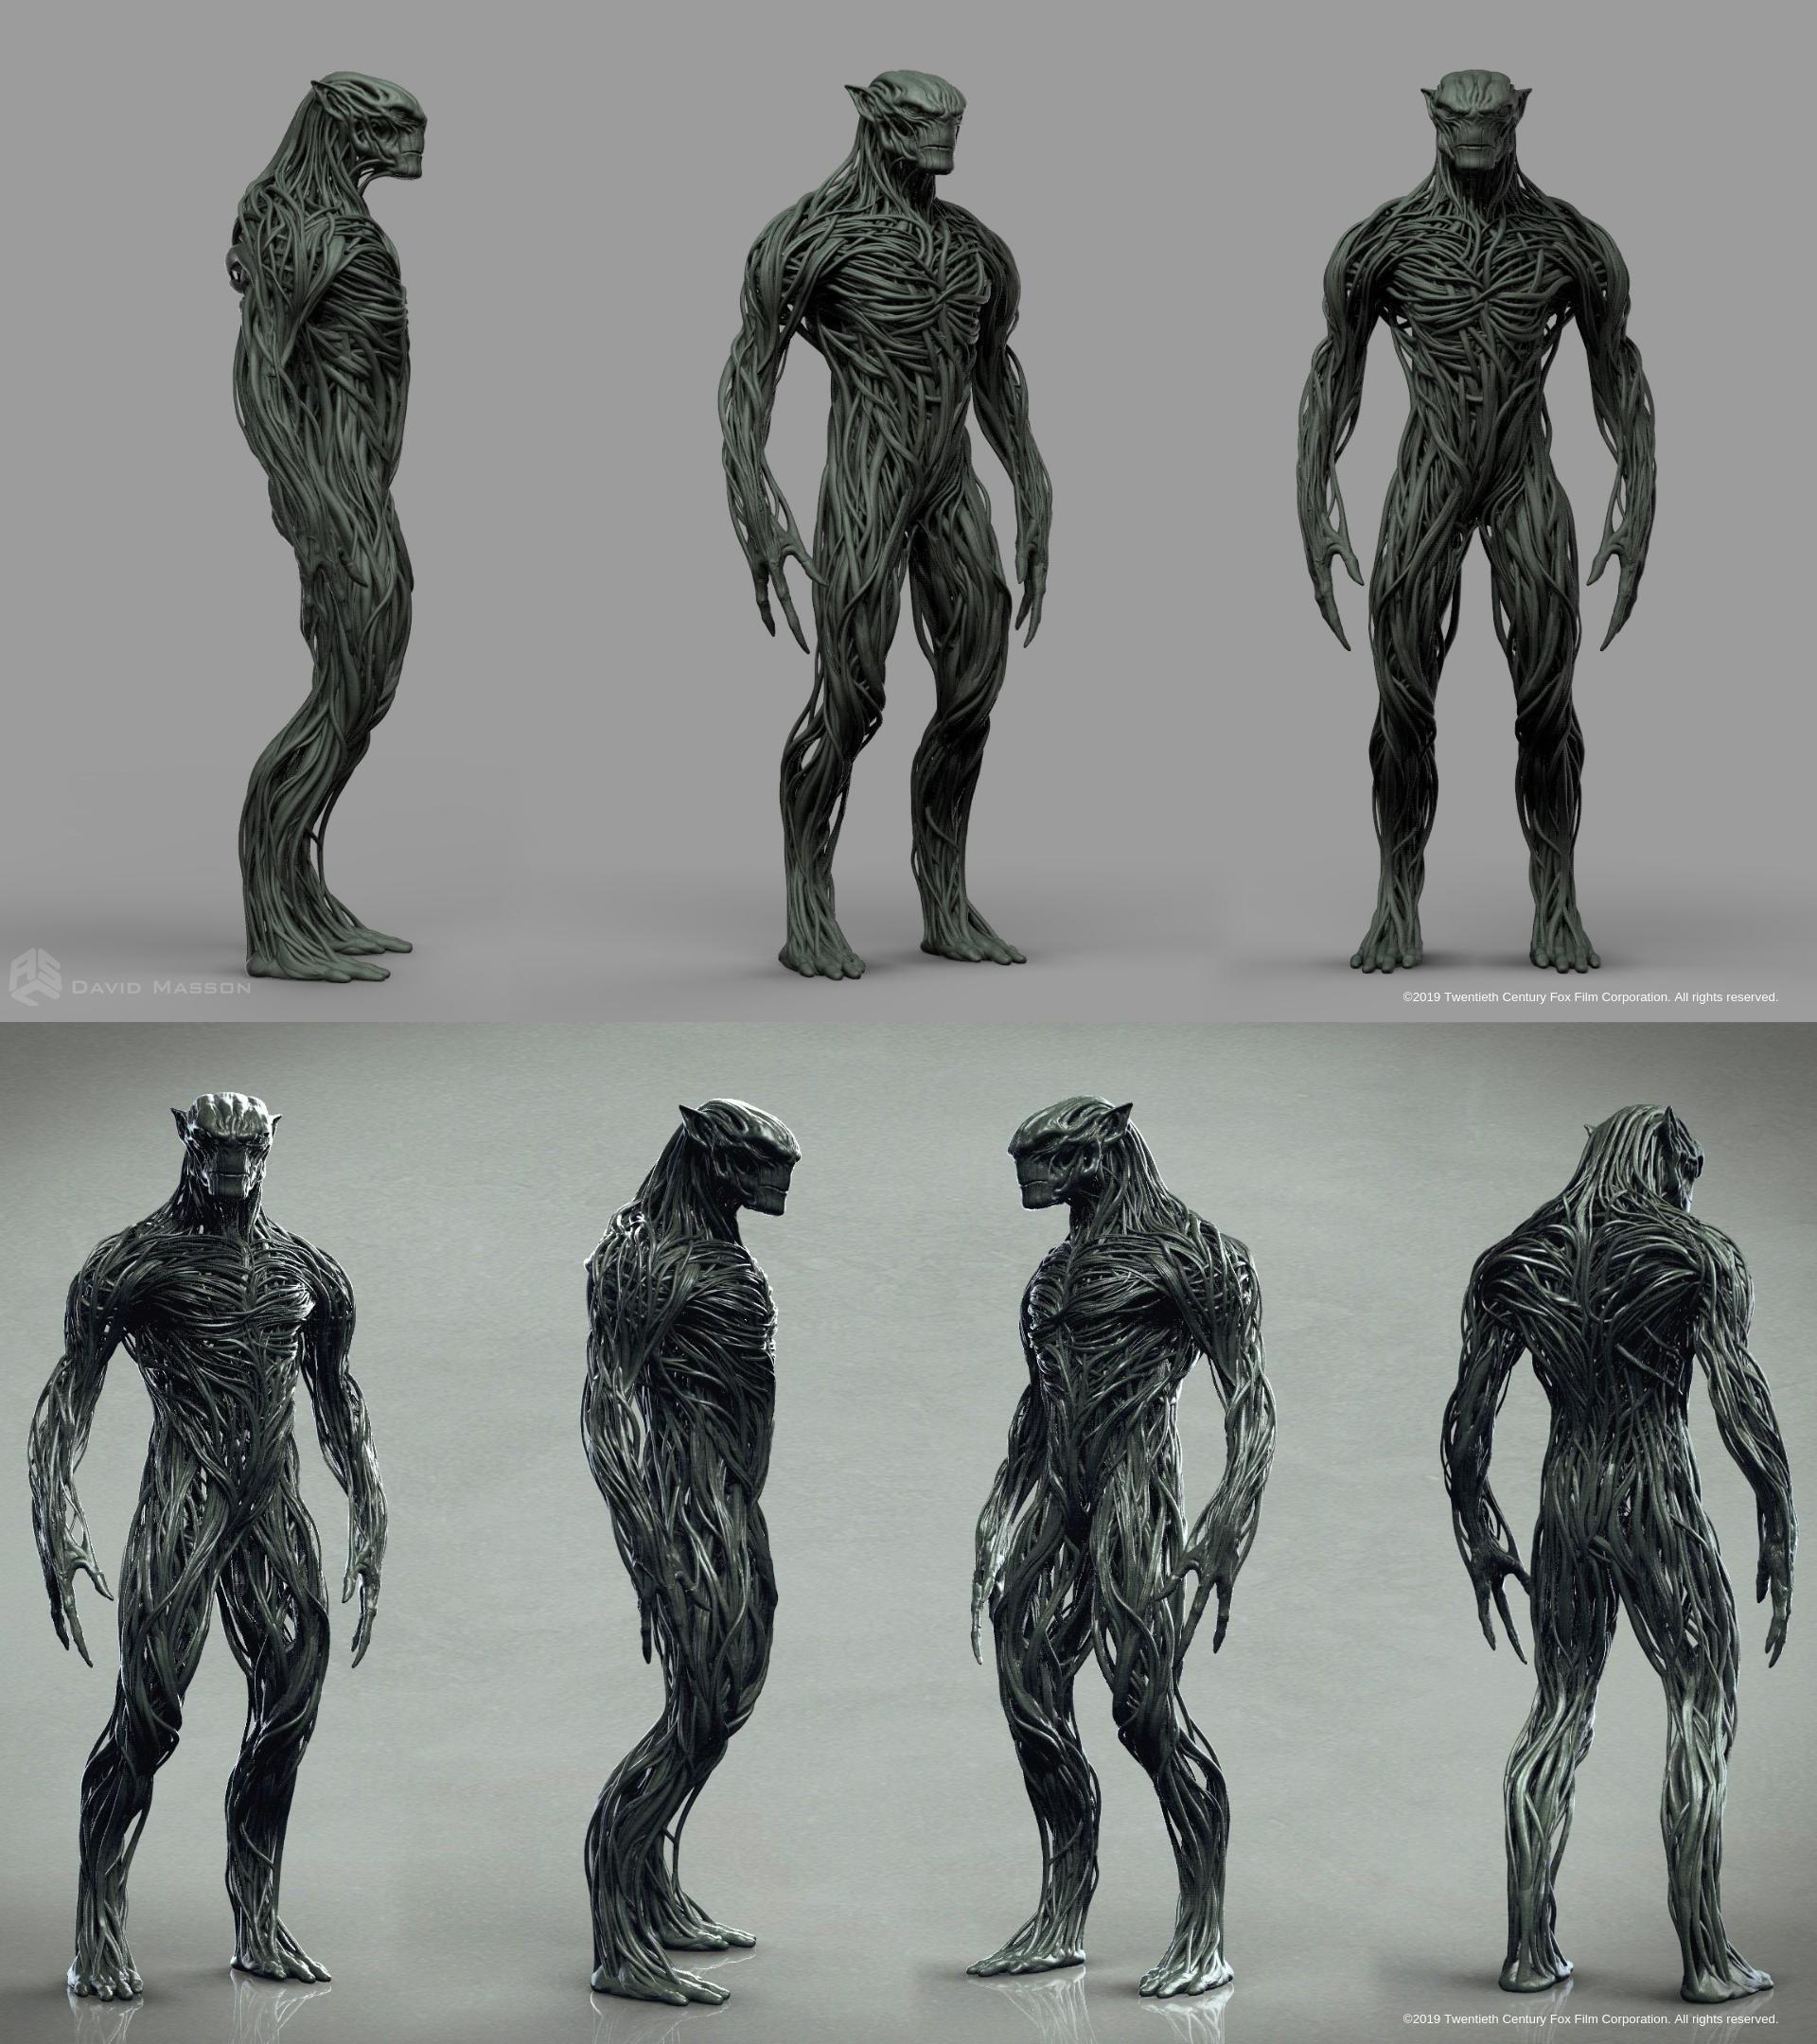 X-Men Dark Phoenix Skrulls concept art